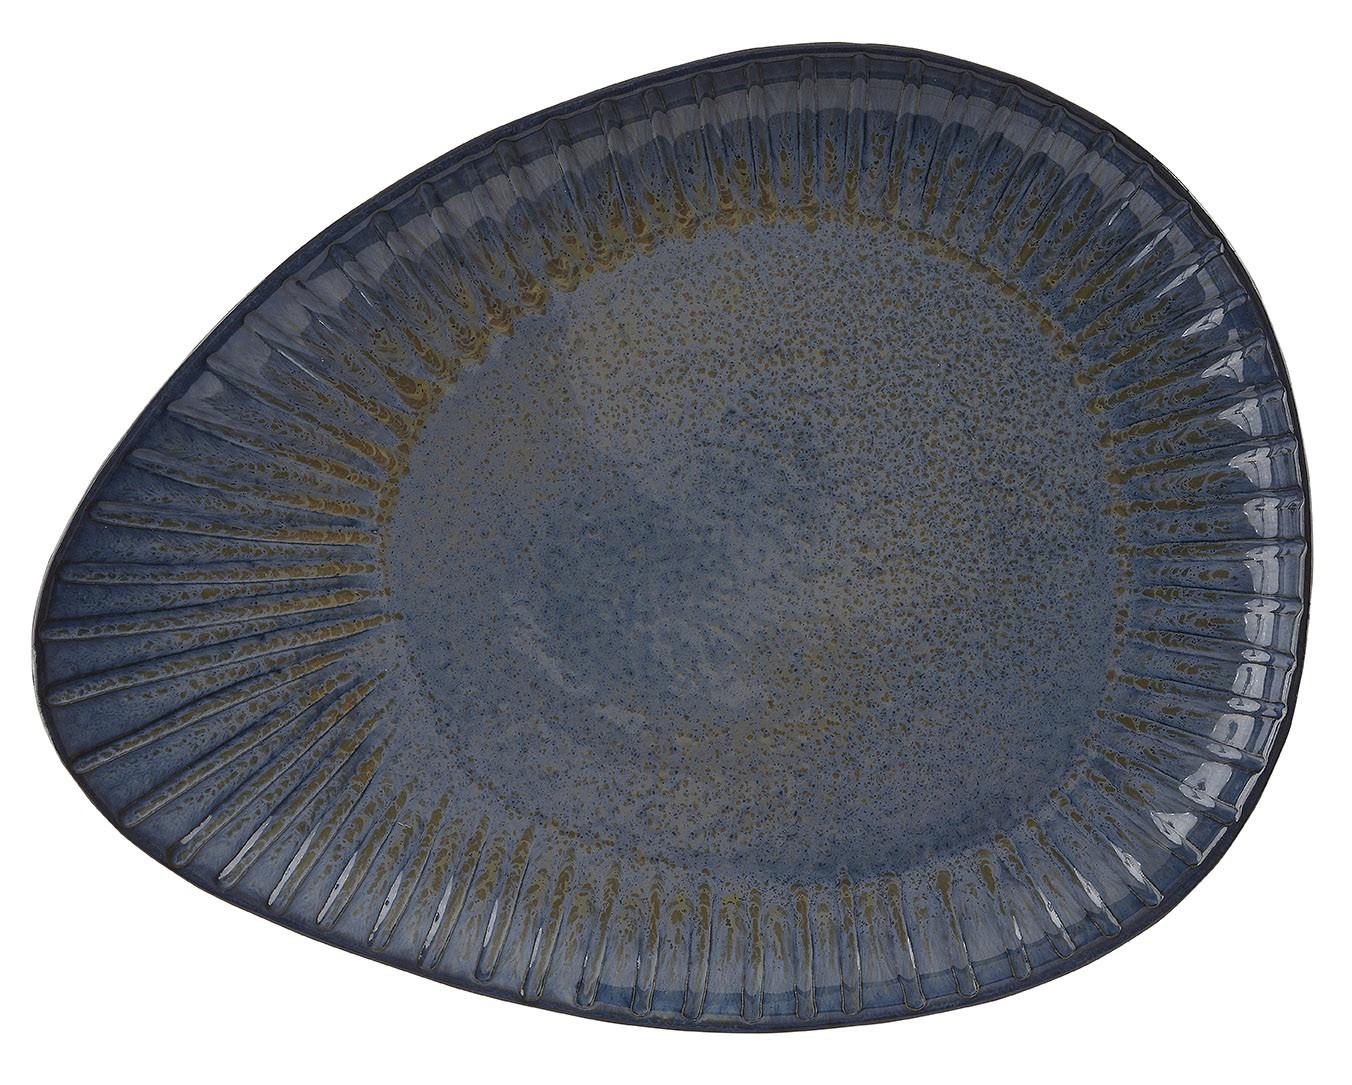 Rustico Impresiones Egeo oval 34cm Plate